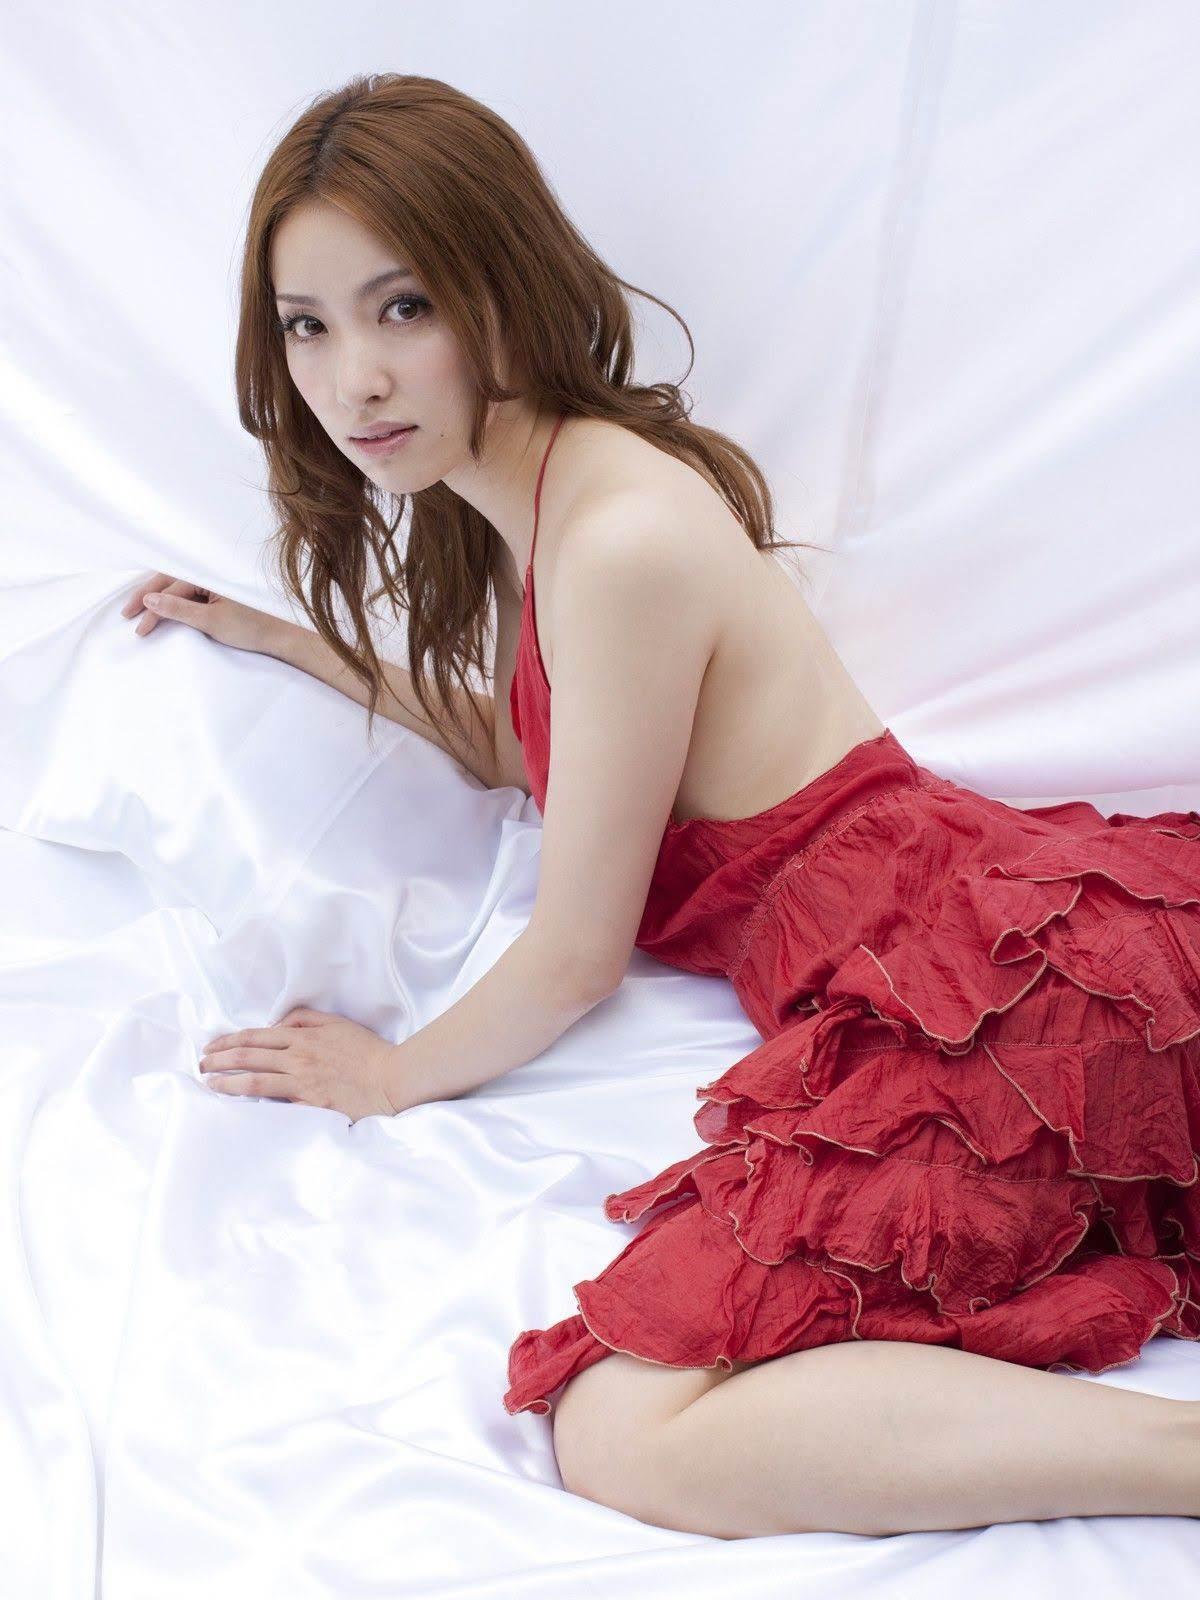 [Image.tv] 瀬戸早妃 Saki Seto Chance after writing the true